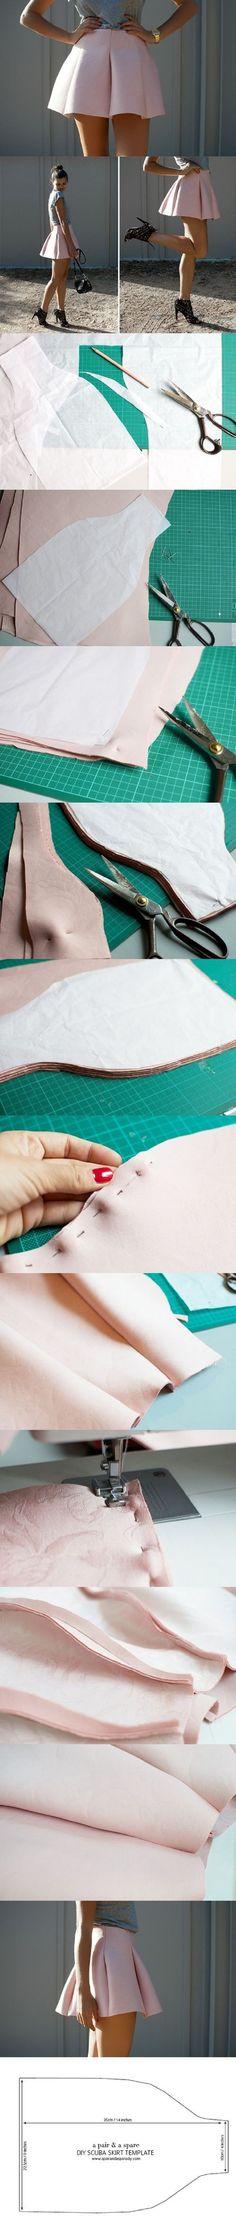 Scuba Mini Skirt Tutorial - 15 Chic Winter Fashion DIYs That Are Totally Easy   GleamItUp